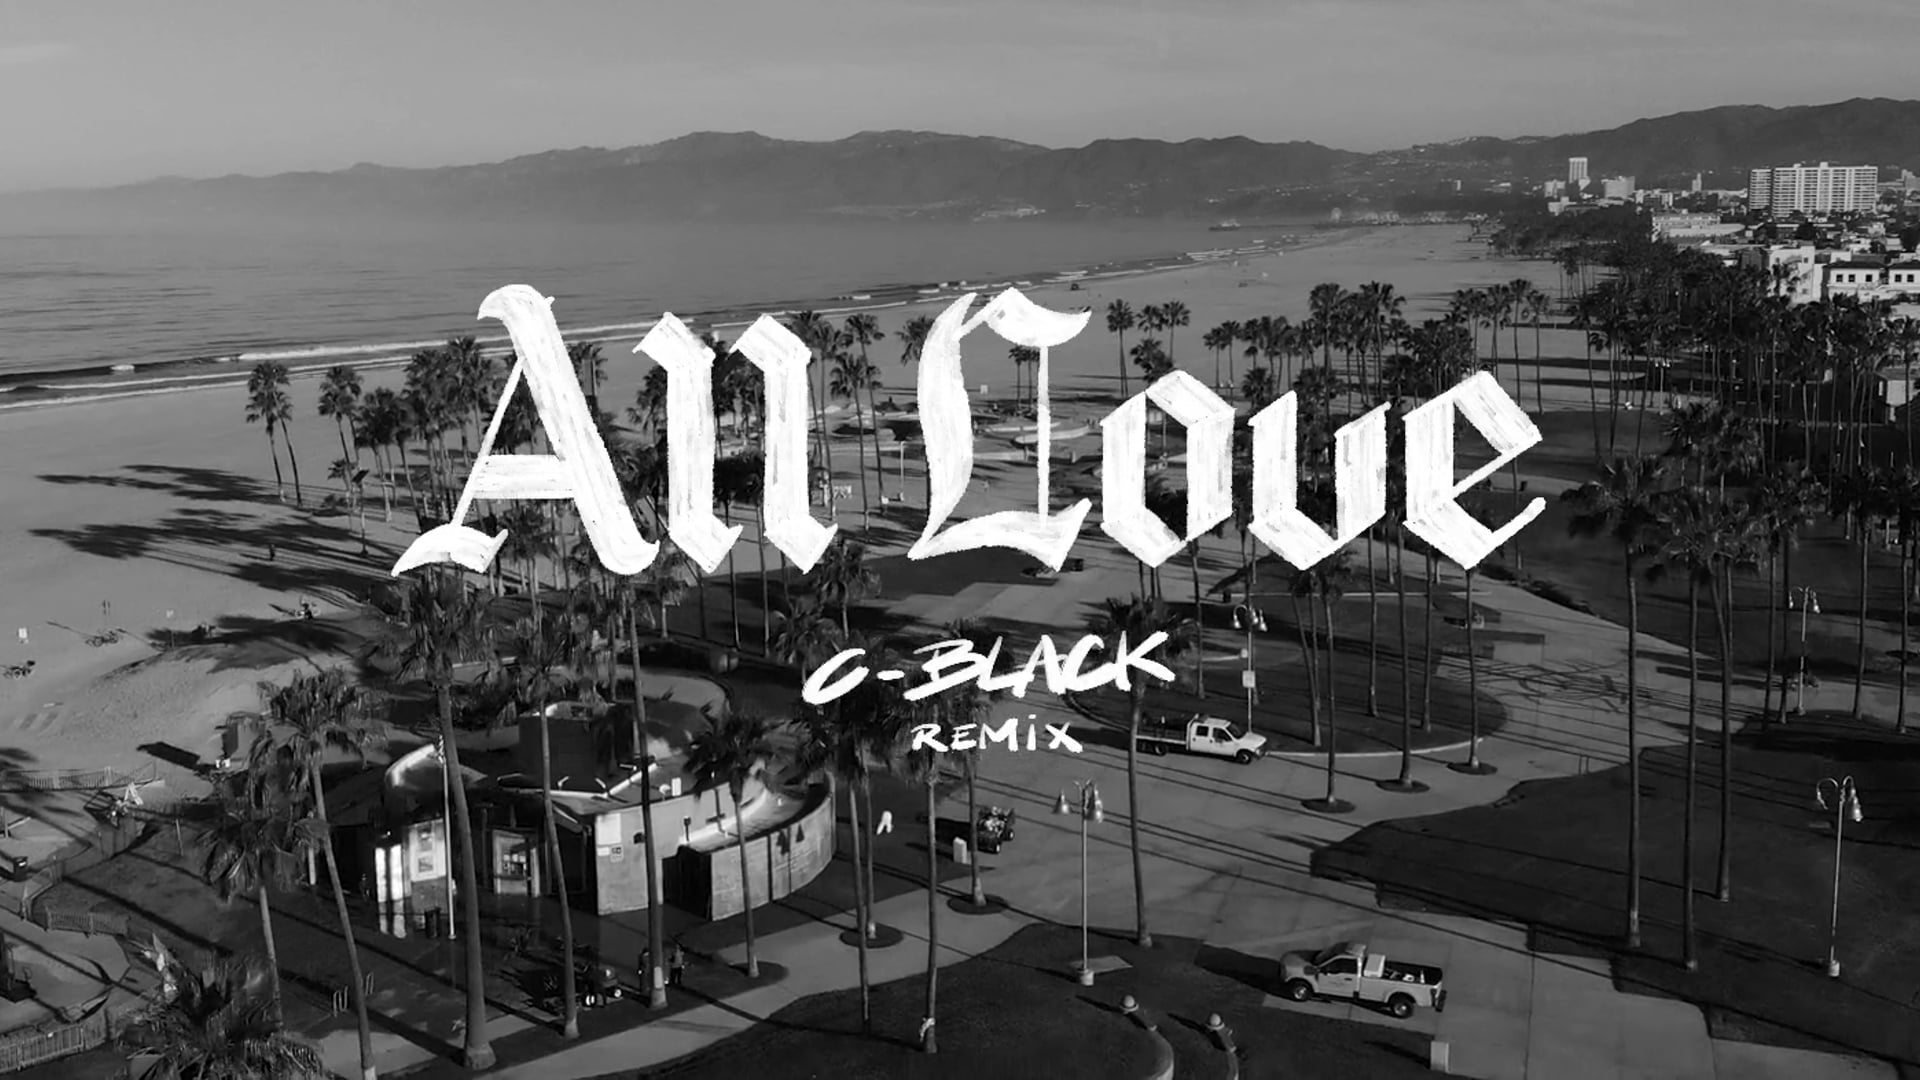 C-BLACK - ALL LOVE ( remix )